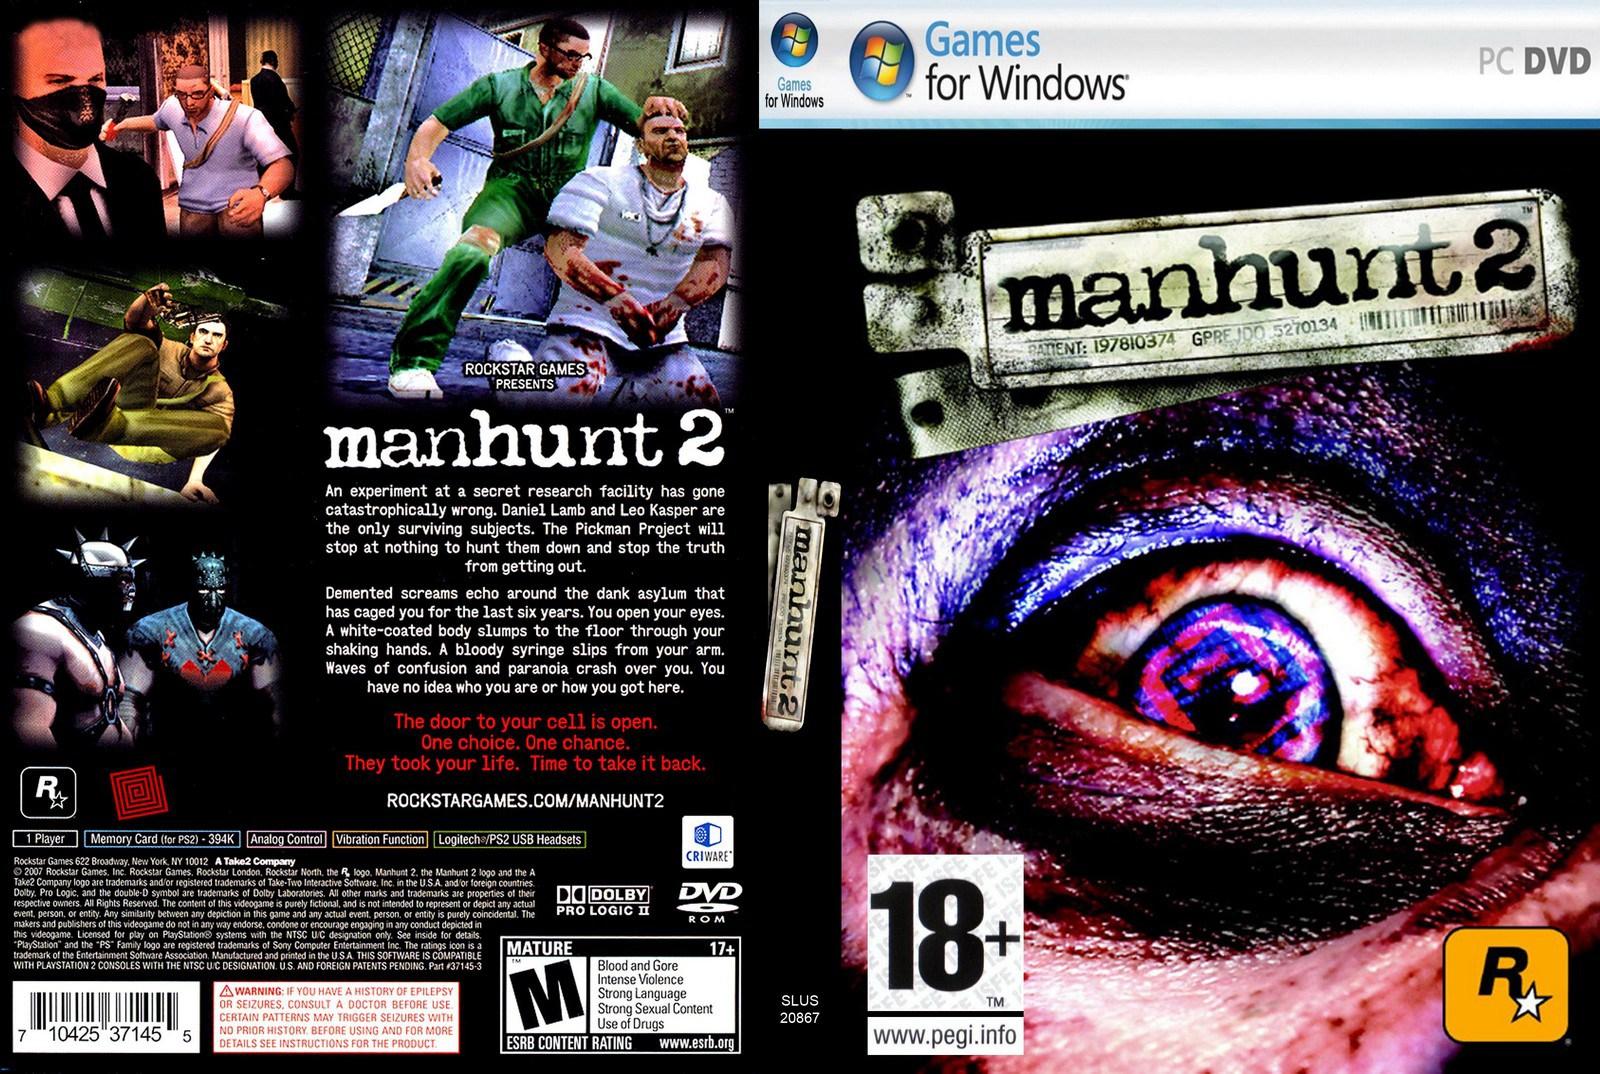 Manhunt-2-PC-Cover.jpg